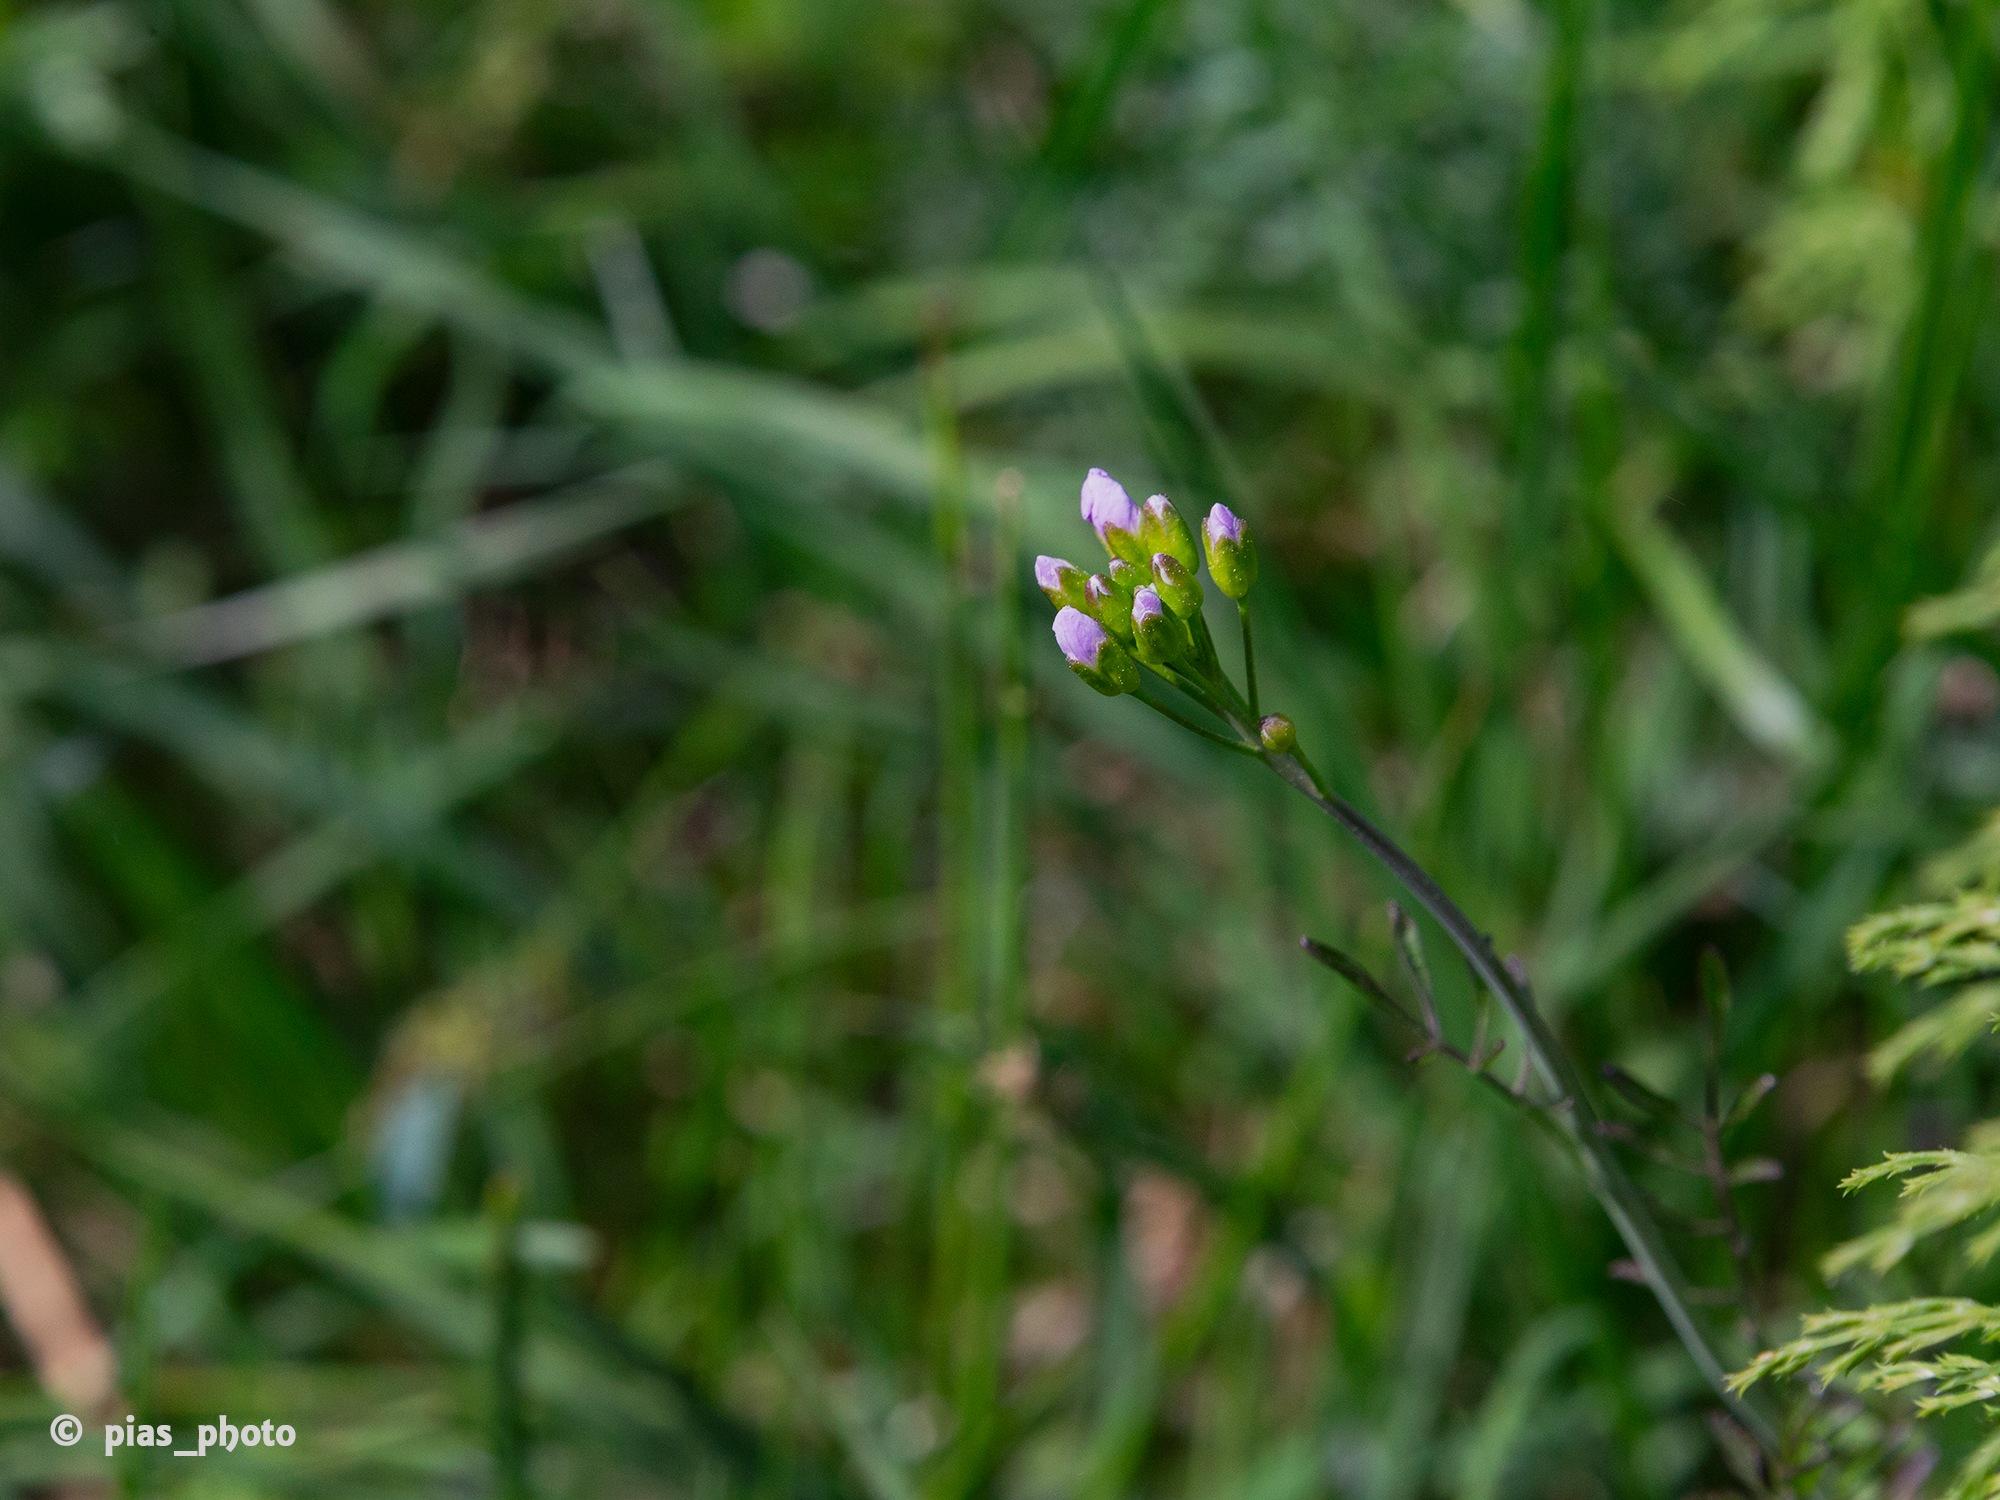 Knoppar by pias_photo